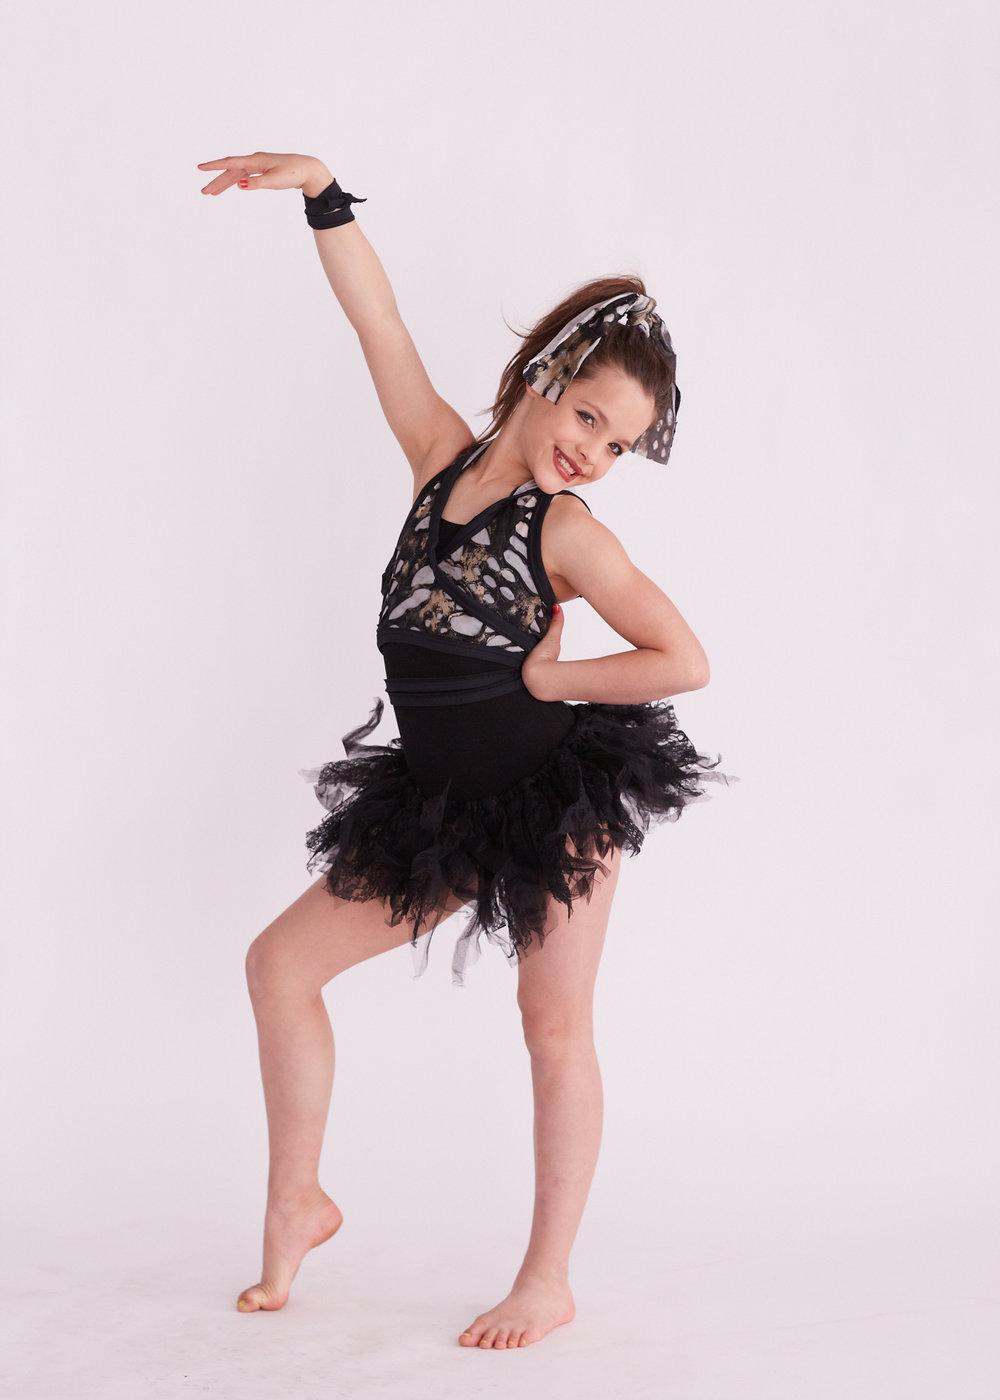 dance poses 098.jpg